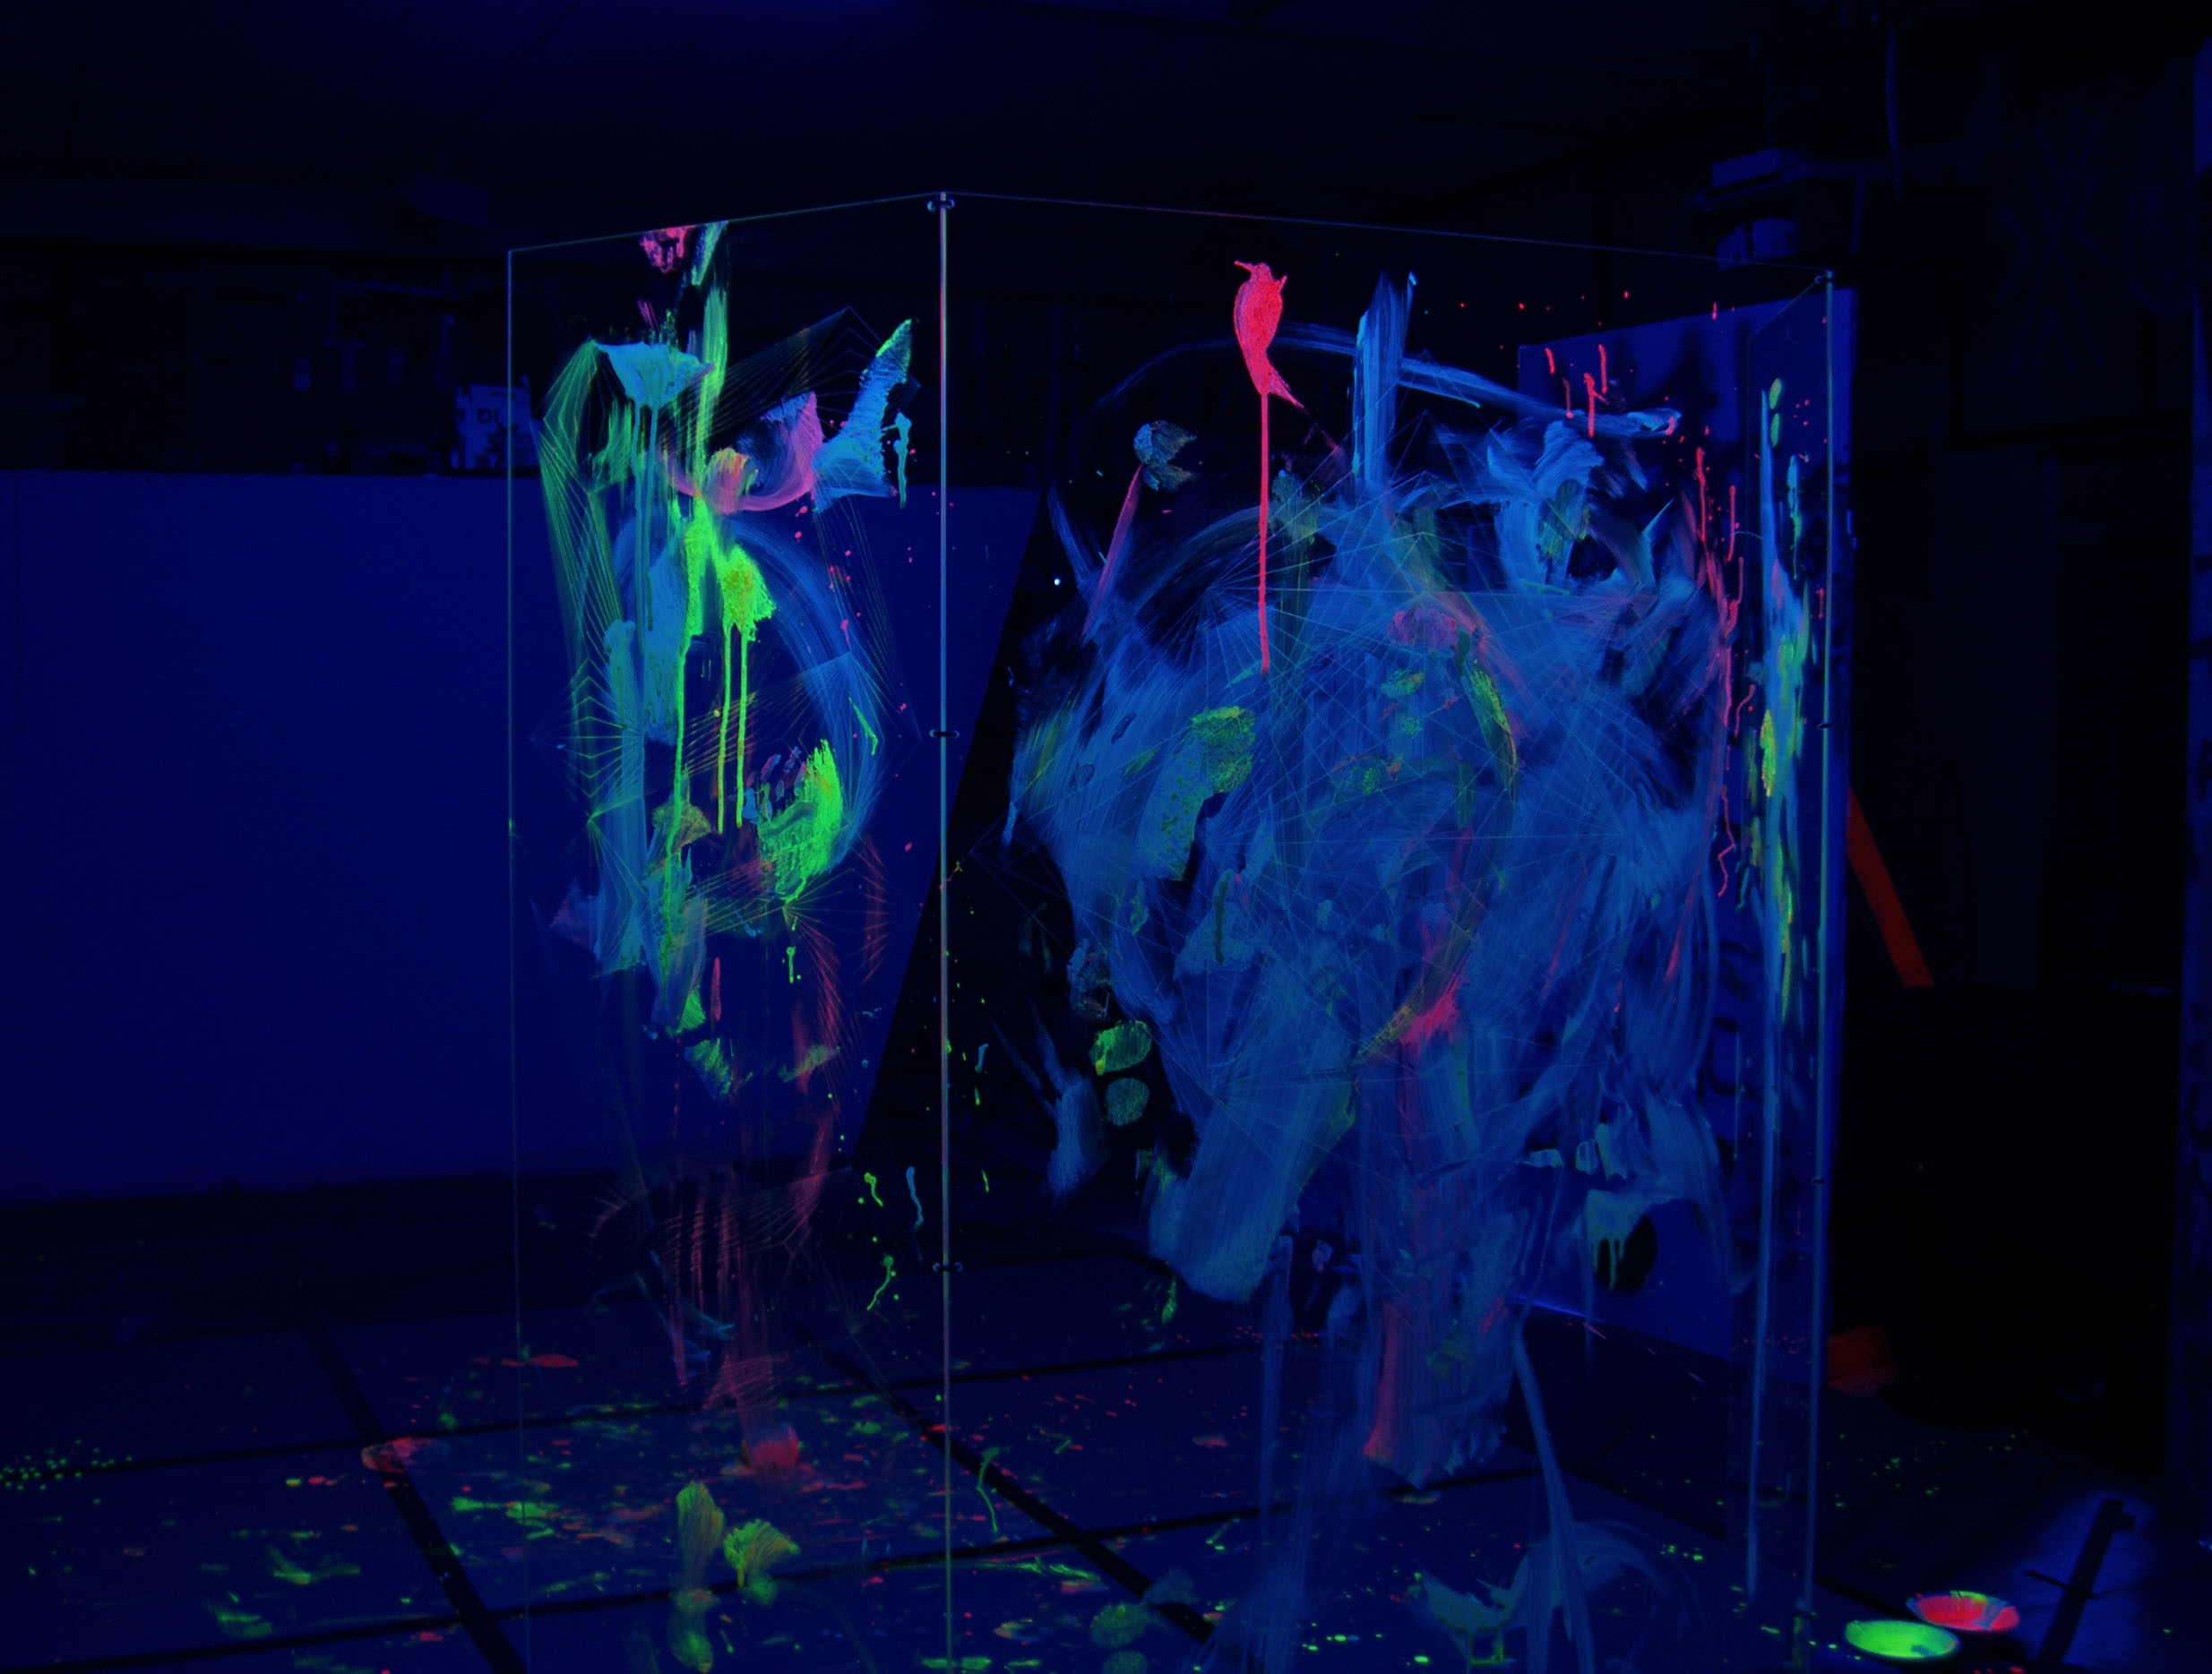 Plexi glass painted